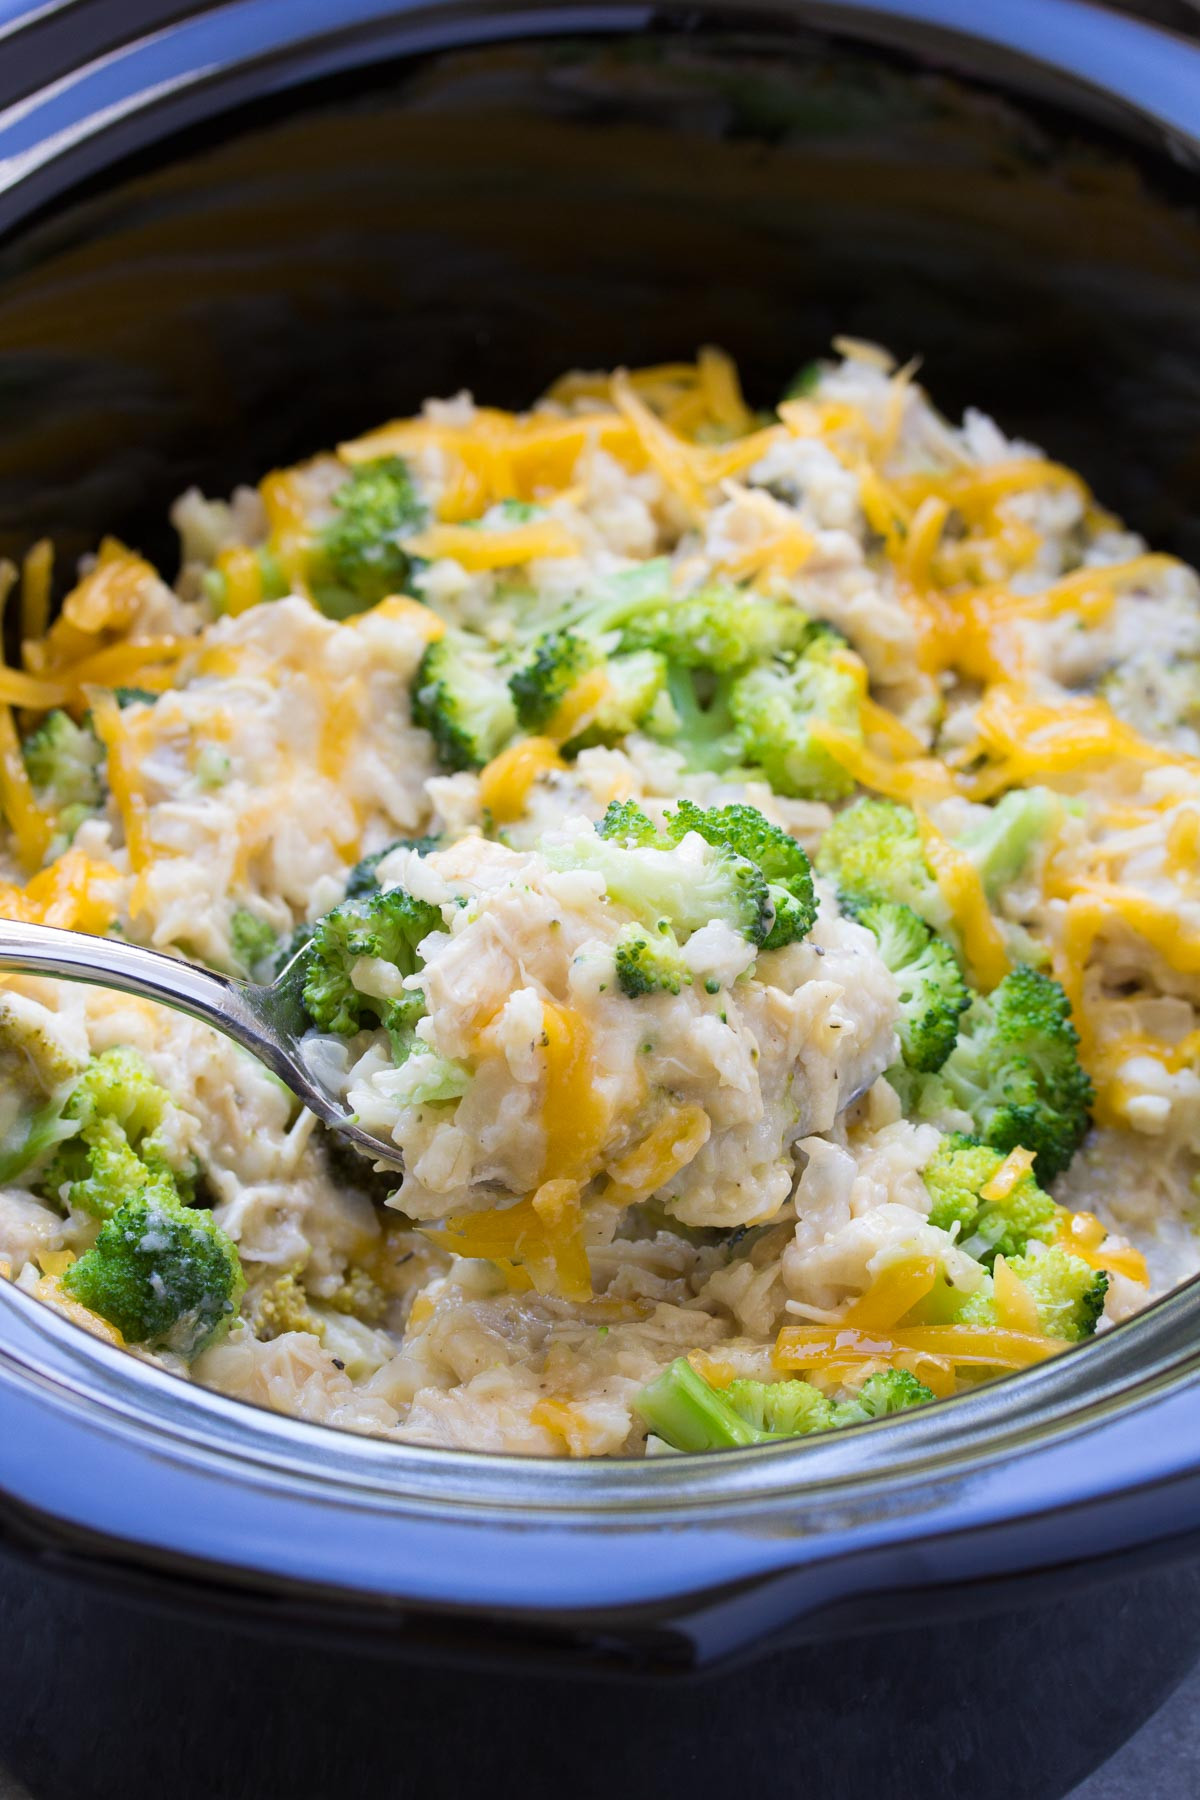 Chicken Broccoli Rice Casserole Recipe  Slow Cooker Chicken Broccoli and Rice Casserole